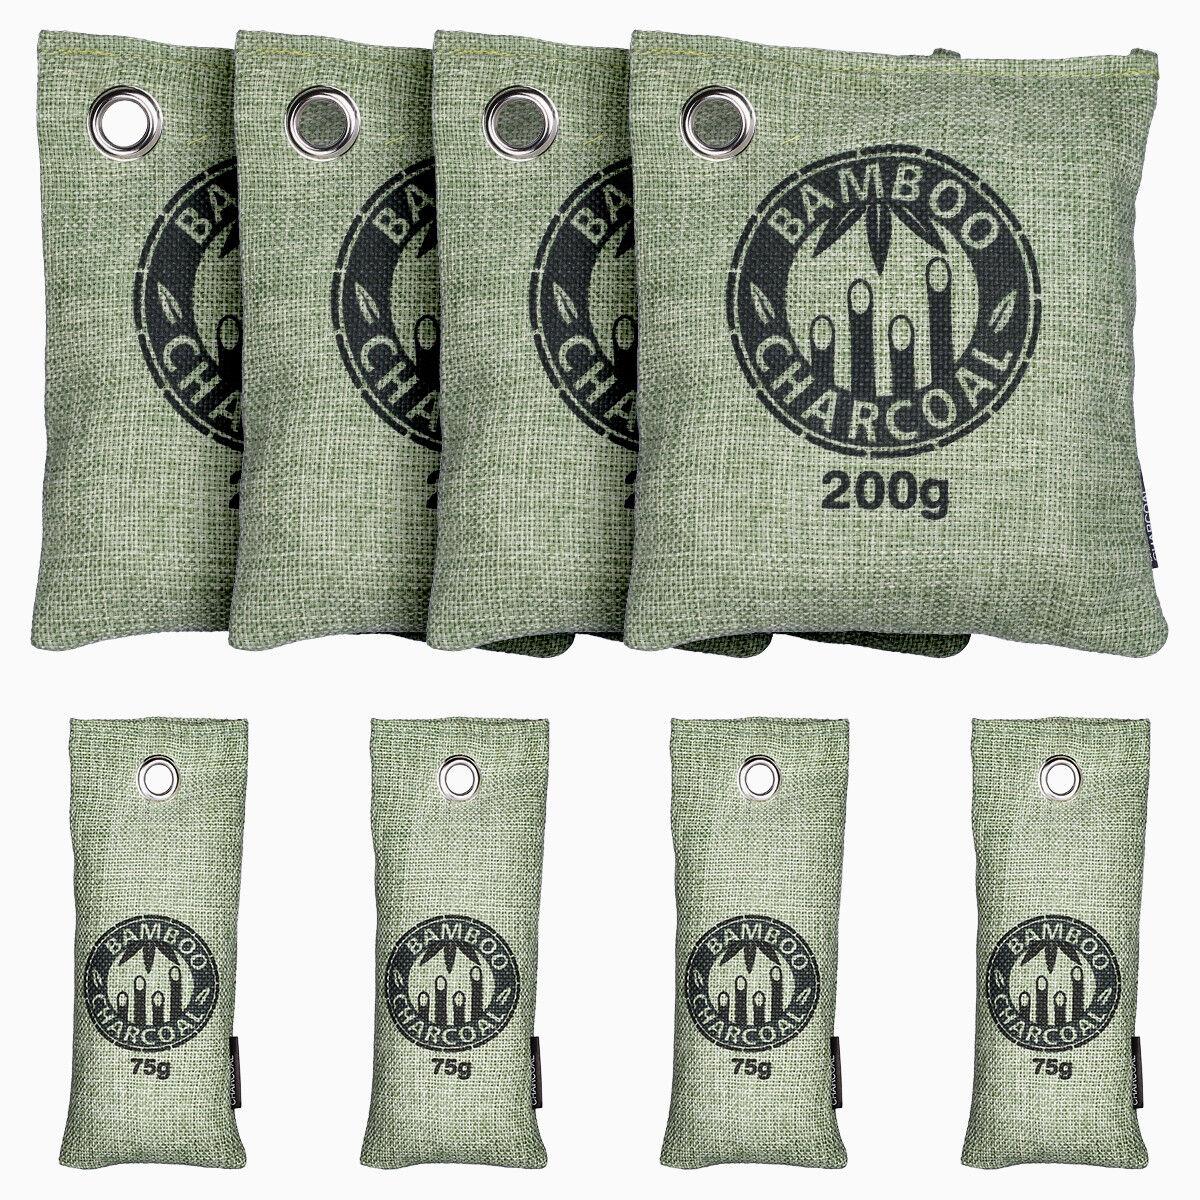 8Pcs Air Purifying Bag Bamboo Charcoal Bag Air Freshener Odor Deodorizer USA